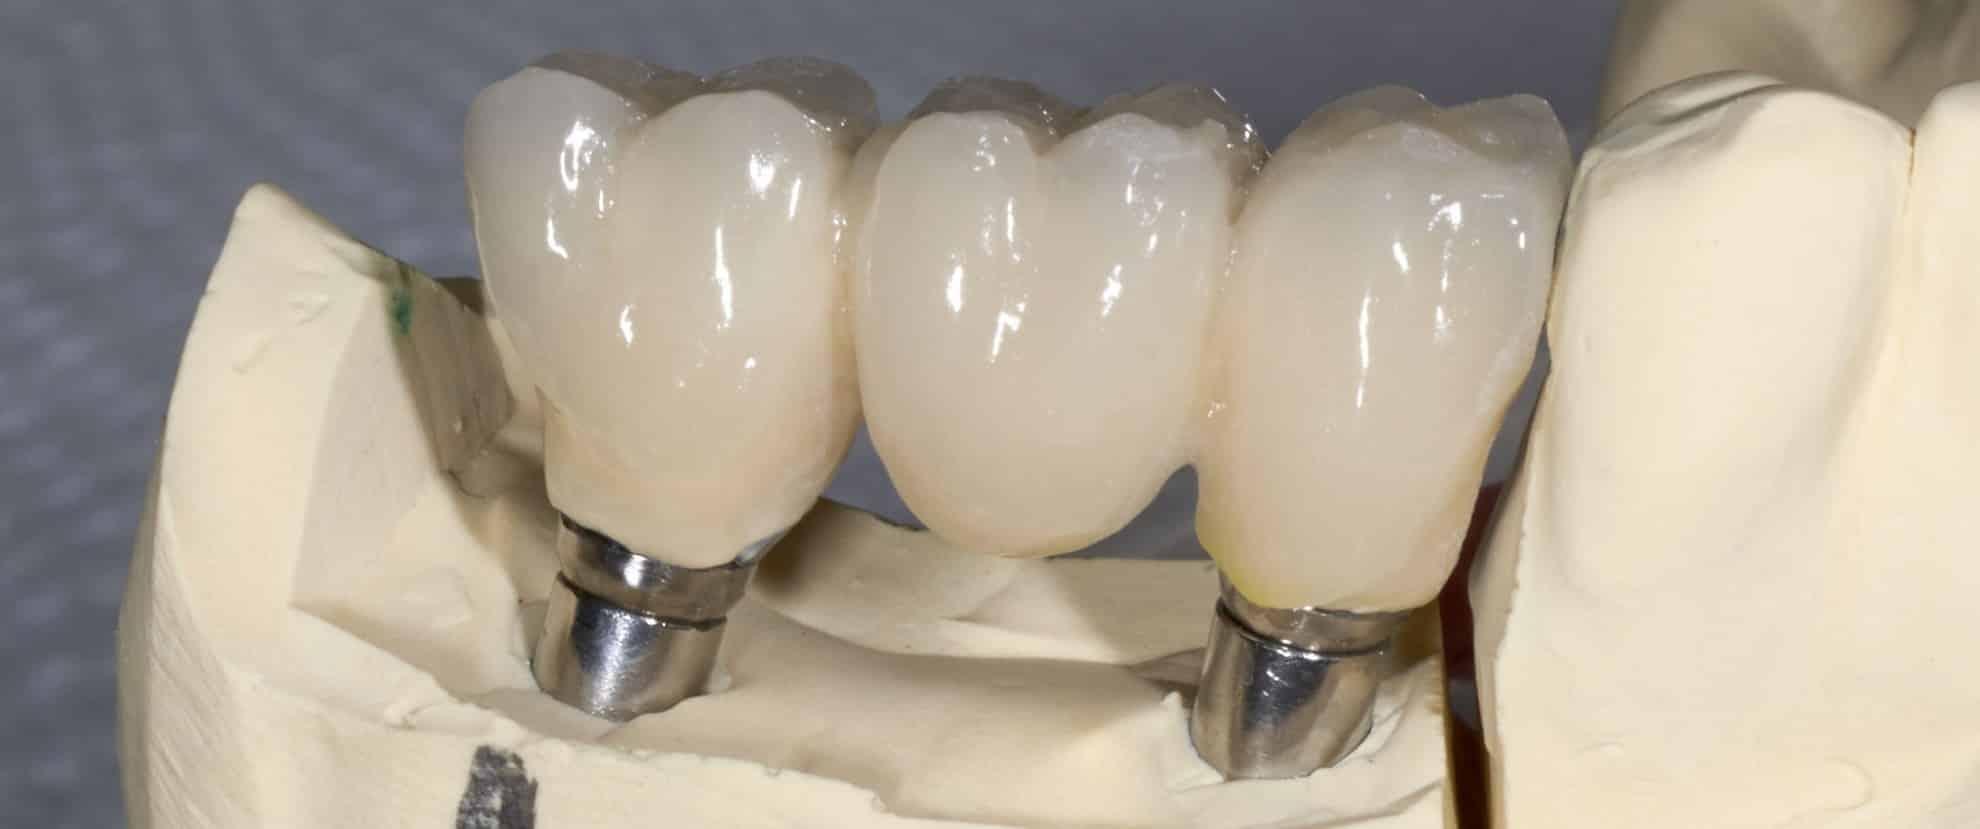 implantaten afbeelding